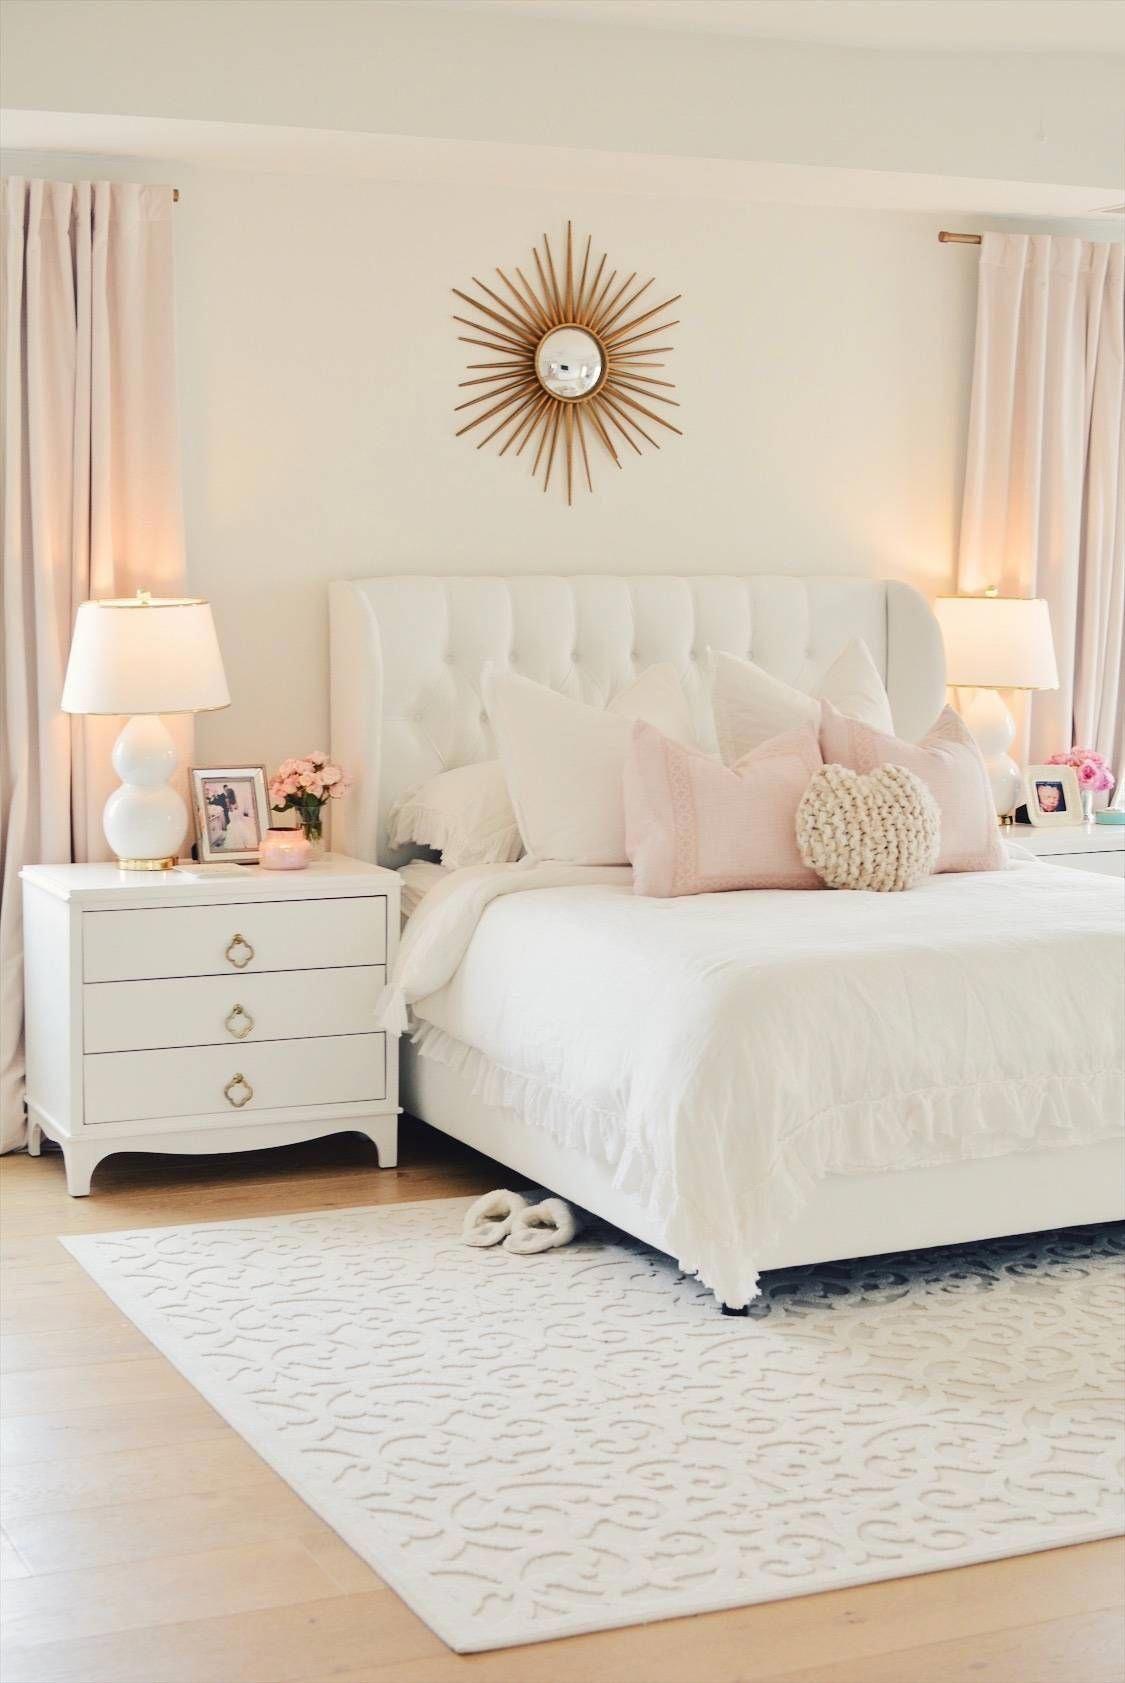 Photo of Why Furniture So Expensive #FurnitureExpoOxnard Code: 3487398166